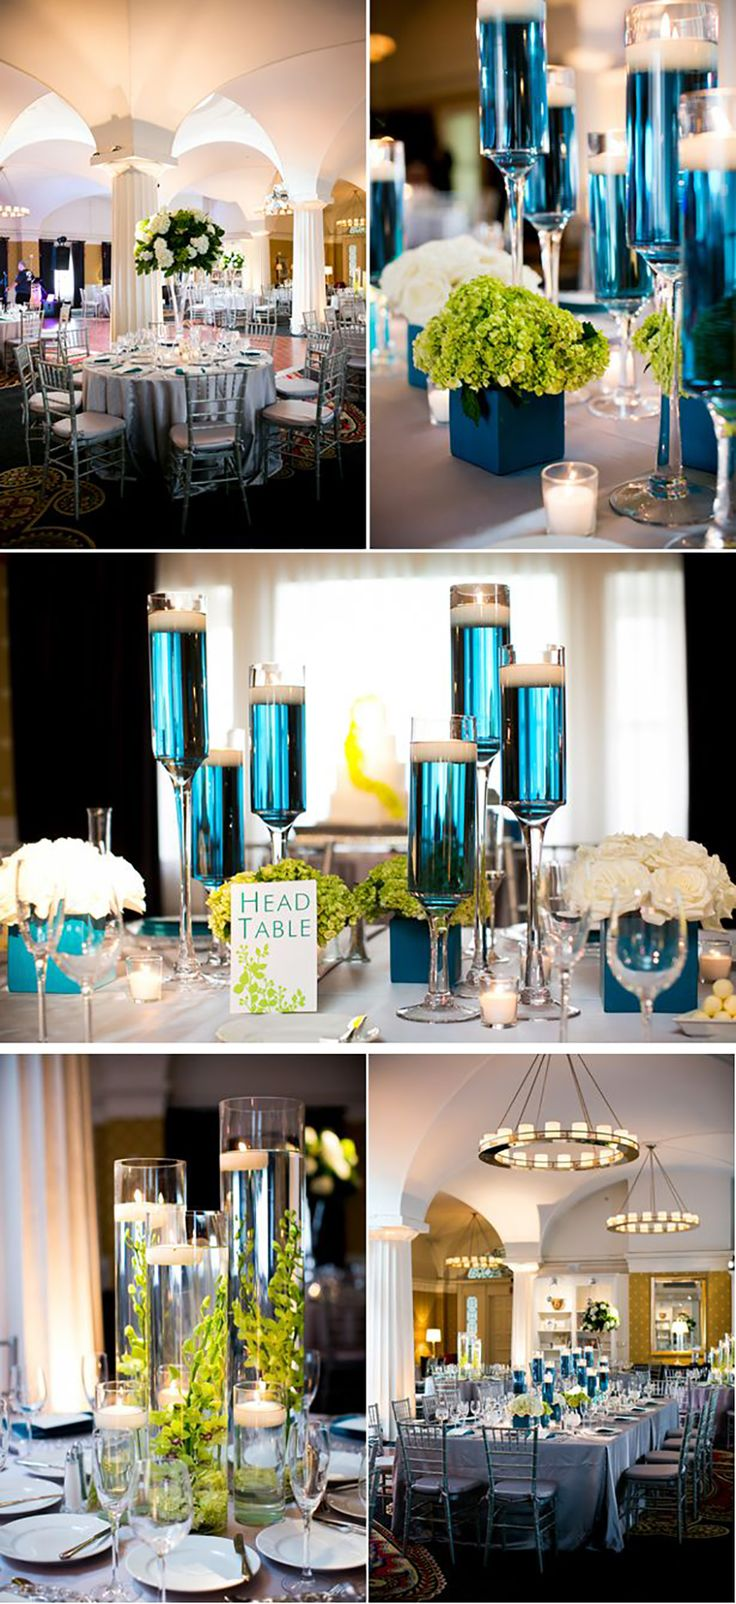 24 Ways to Do a Hotel Wedding in Washington | Inspiration | Washingtonian Bride & Groom